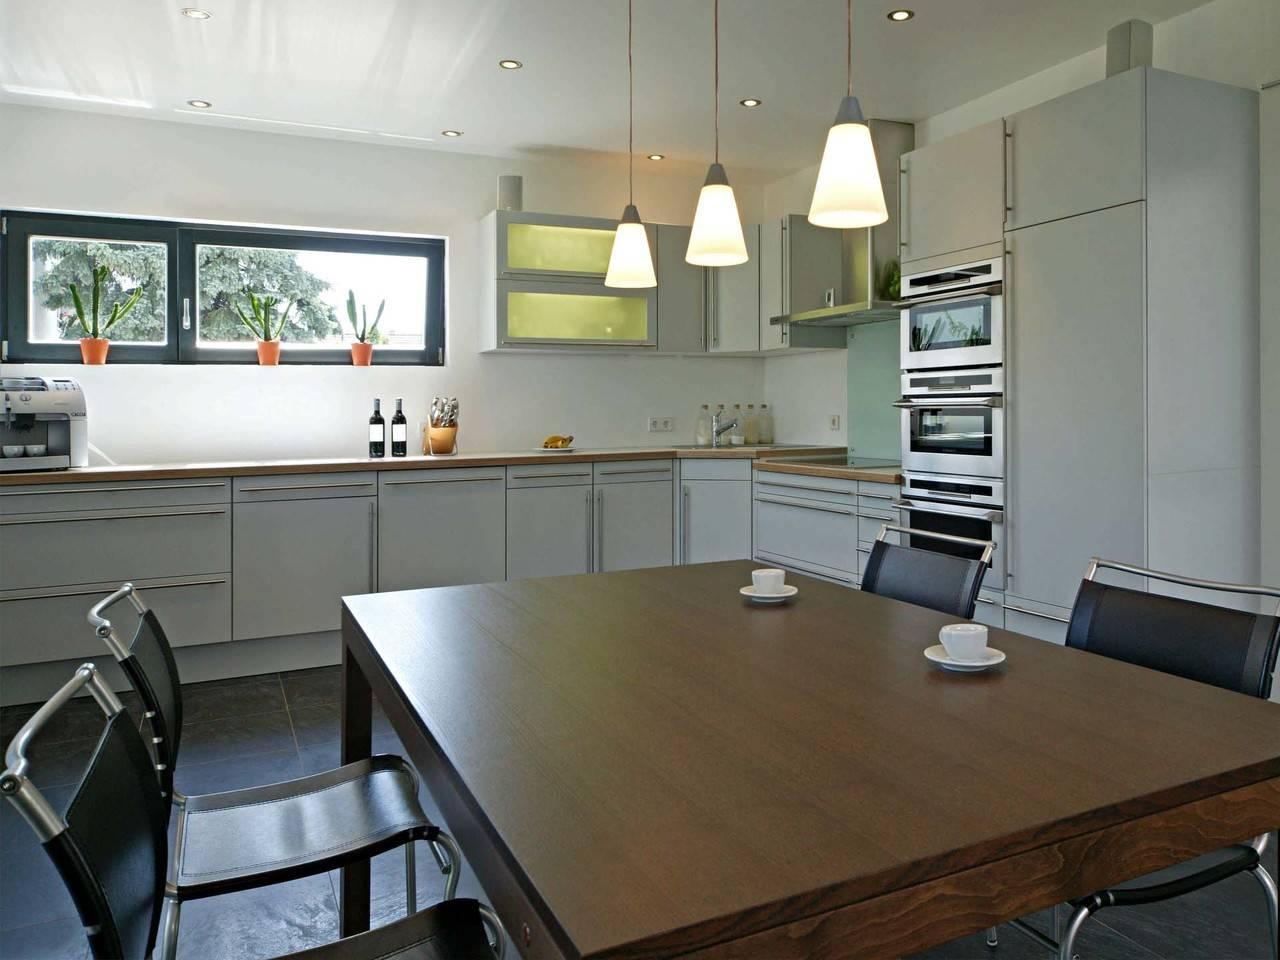 Haus Rauch Fertighaus Weiss Küche